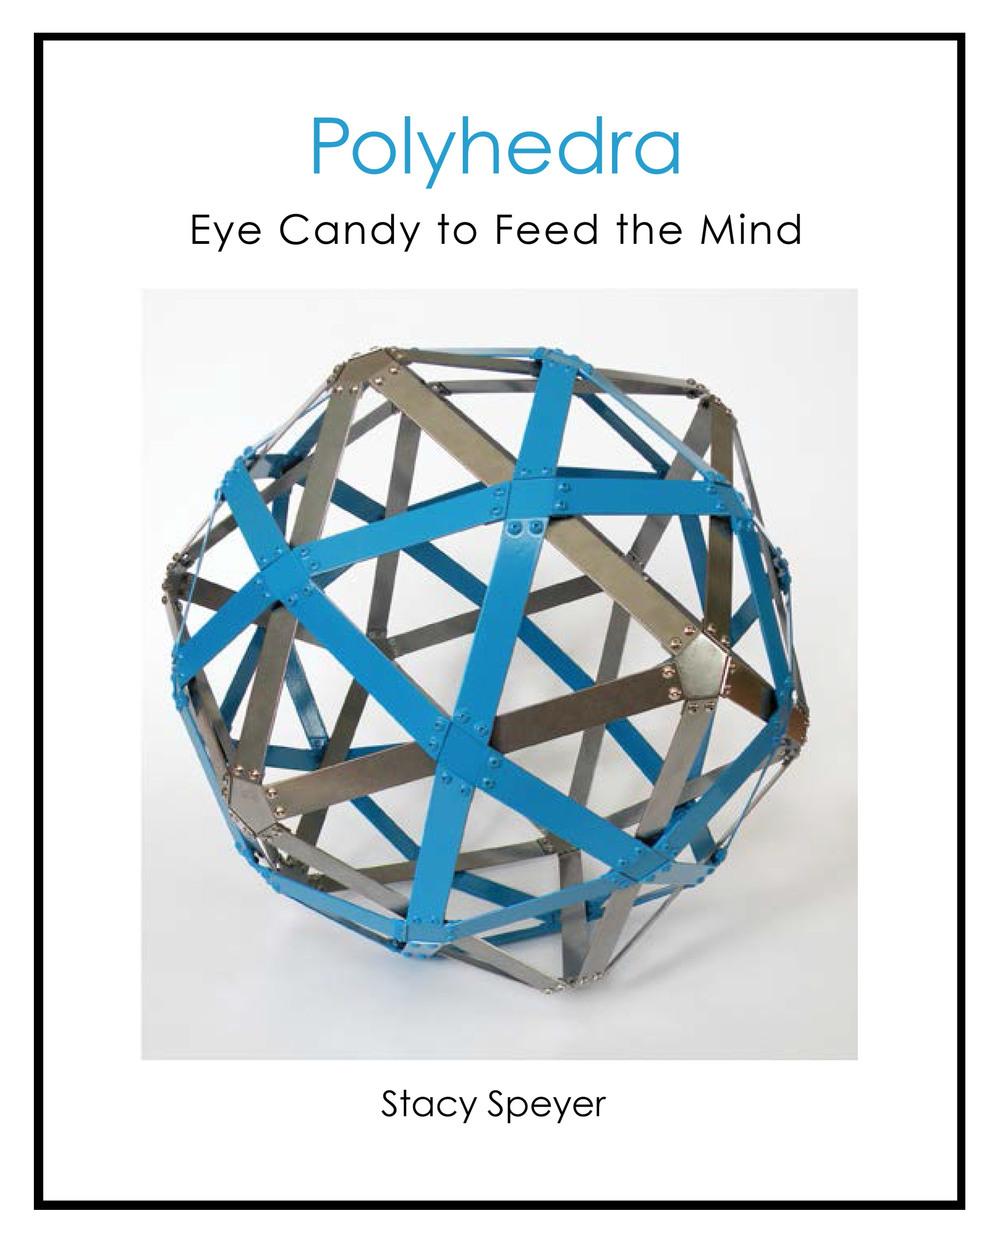 PolyhedraCoverB.jpg